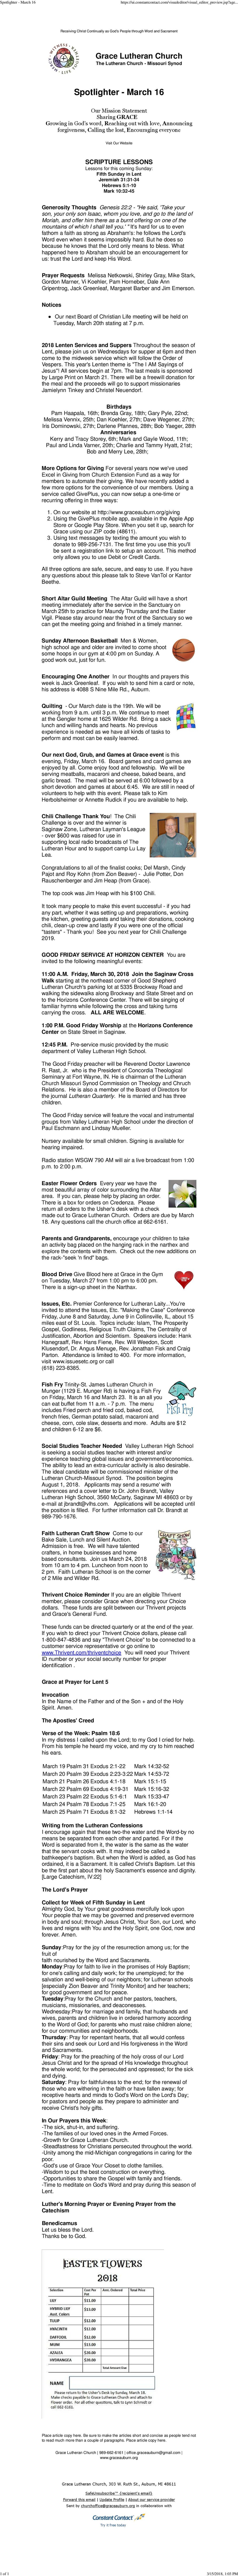 Spotlighter - March 16-page-001.jpg